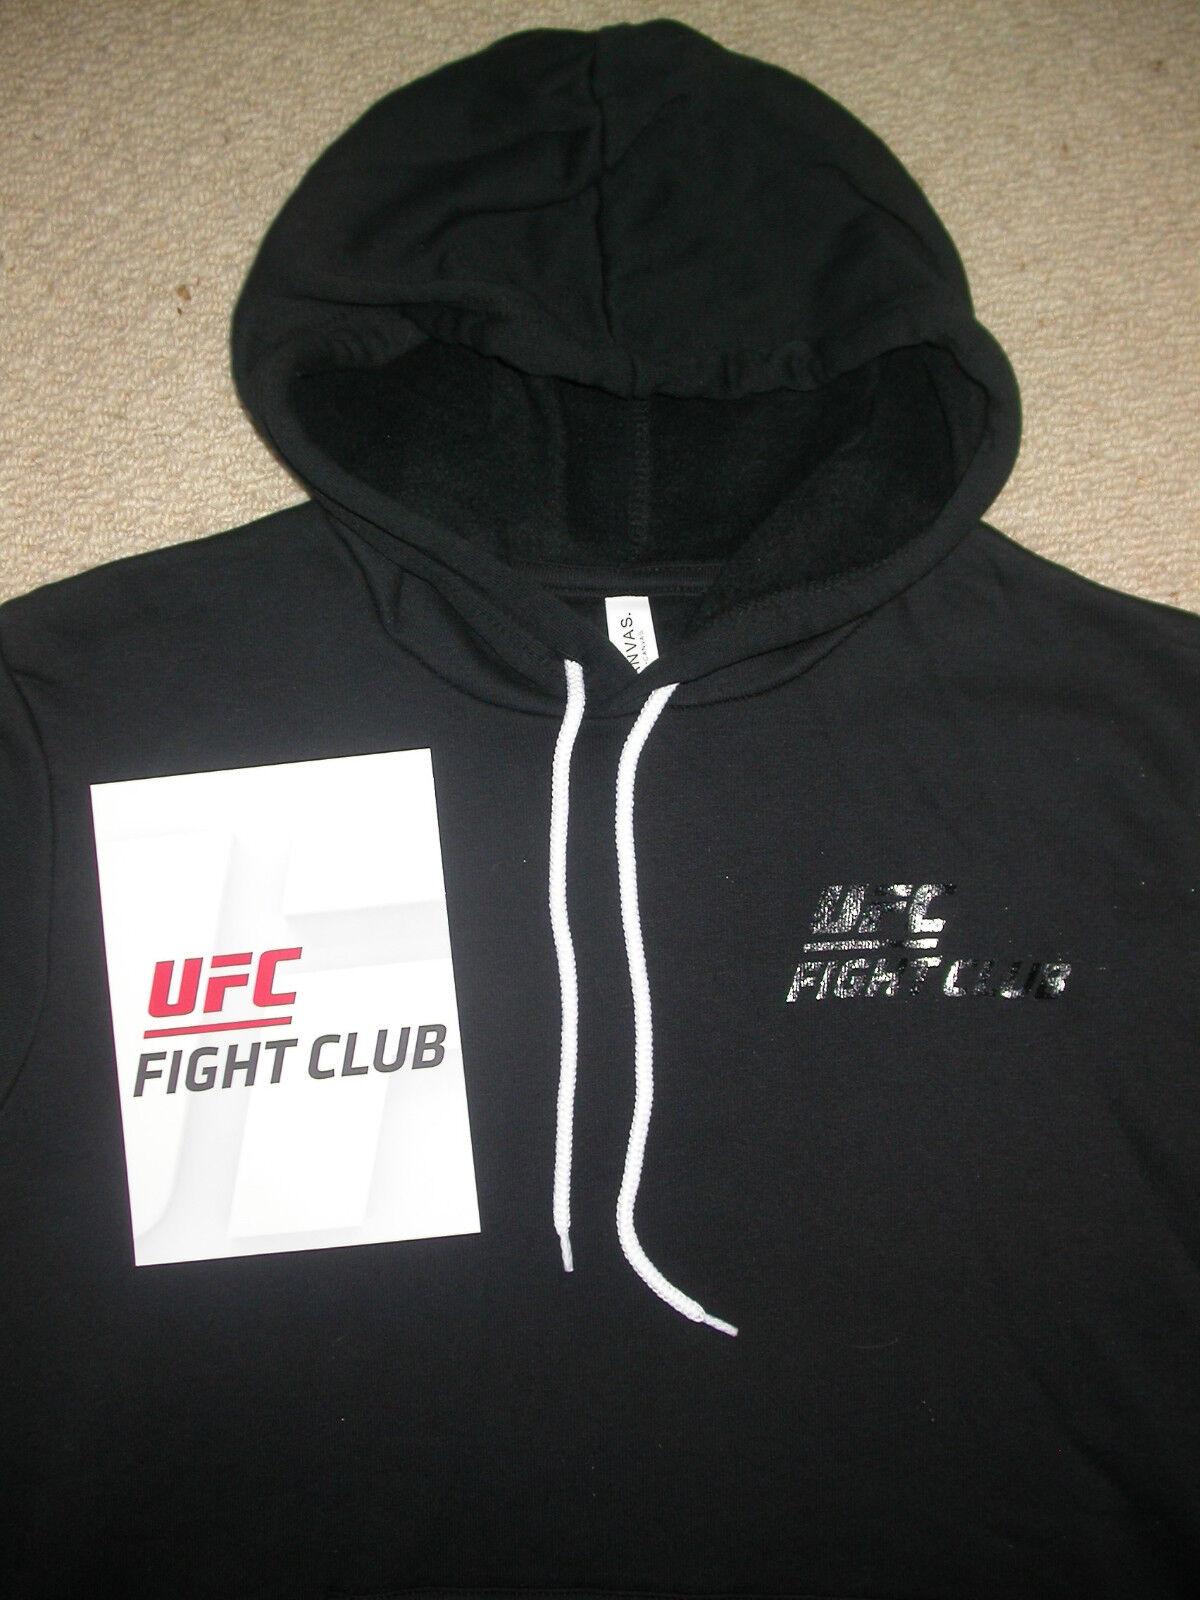 UFC FIGHT CLUB HOODED SWEATSHIRT LARGE L MMA KSW BJJ BOXING GYM CROSSFIT WWE NEW